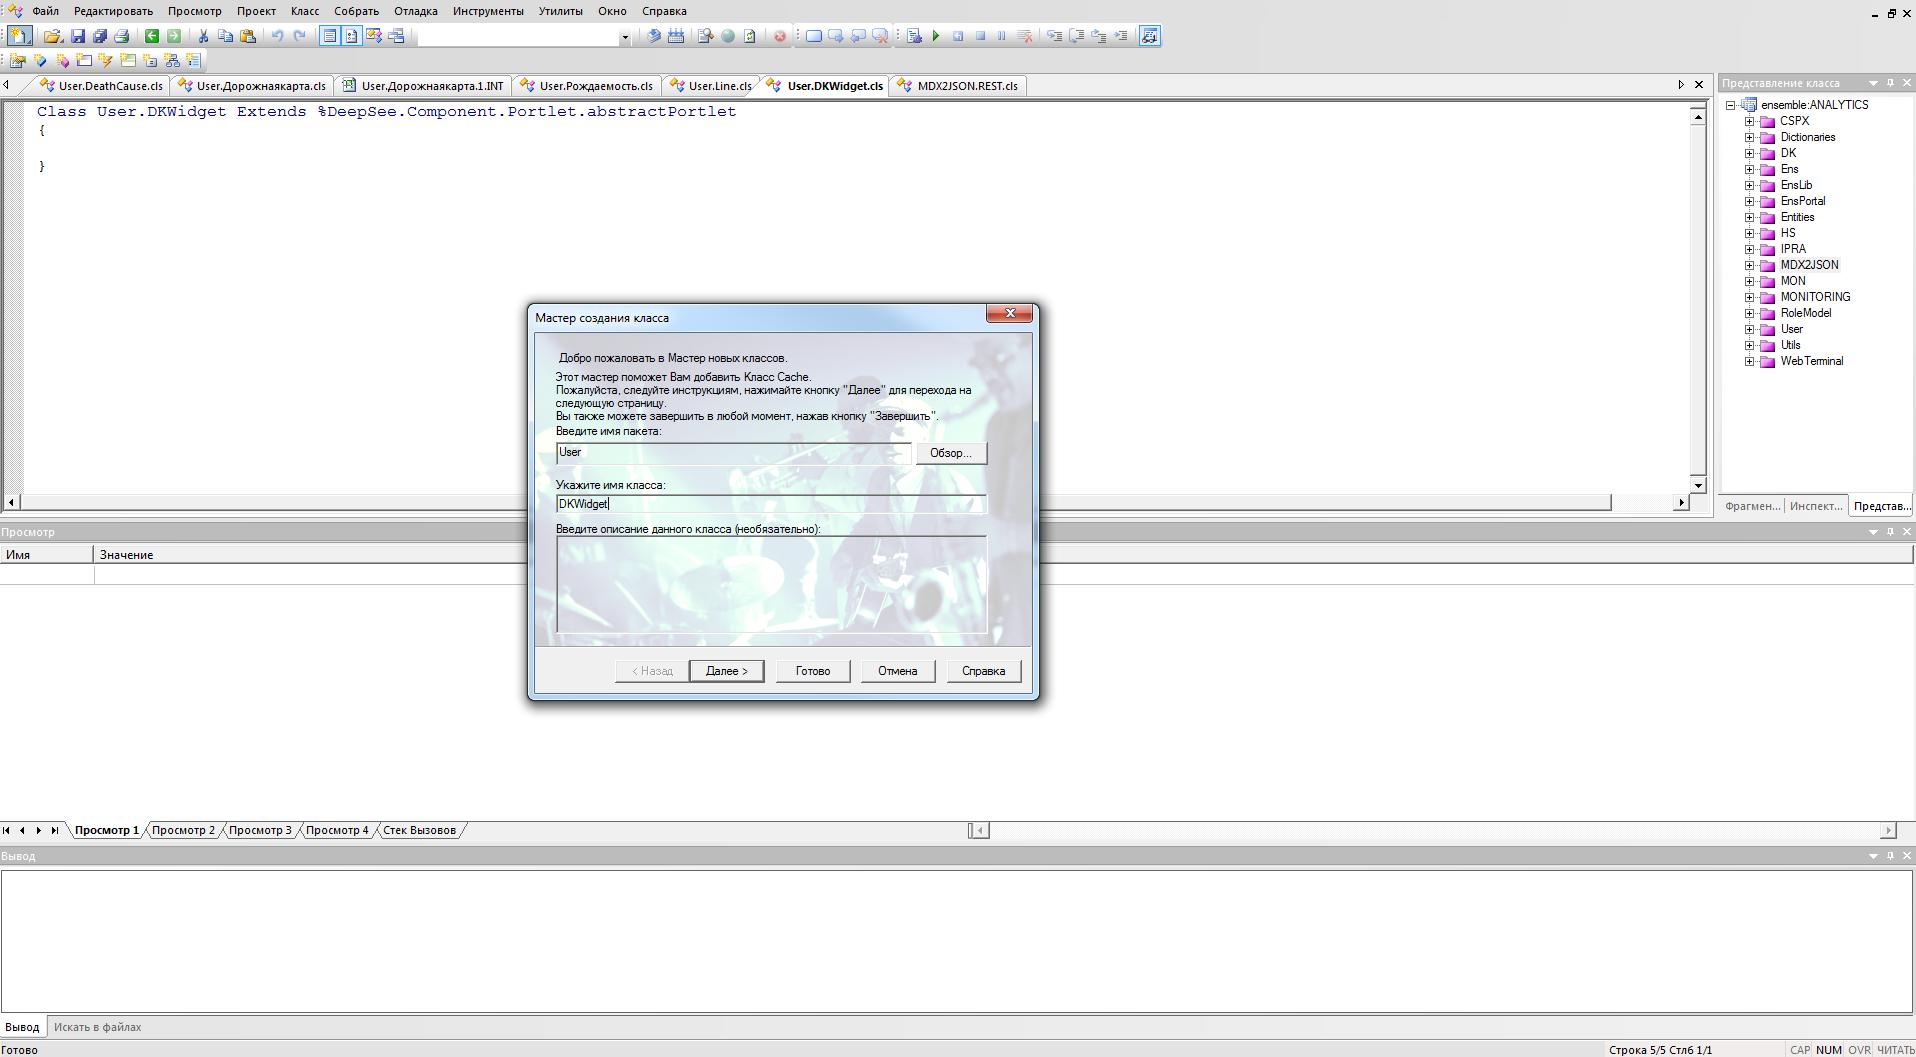 Intersystems DeepSee. Простая и быстрая визуализация данных - 8